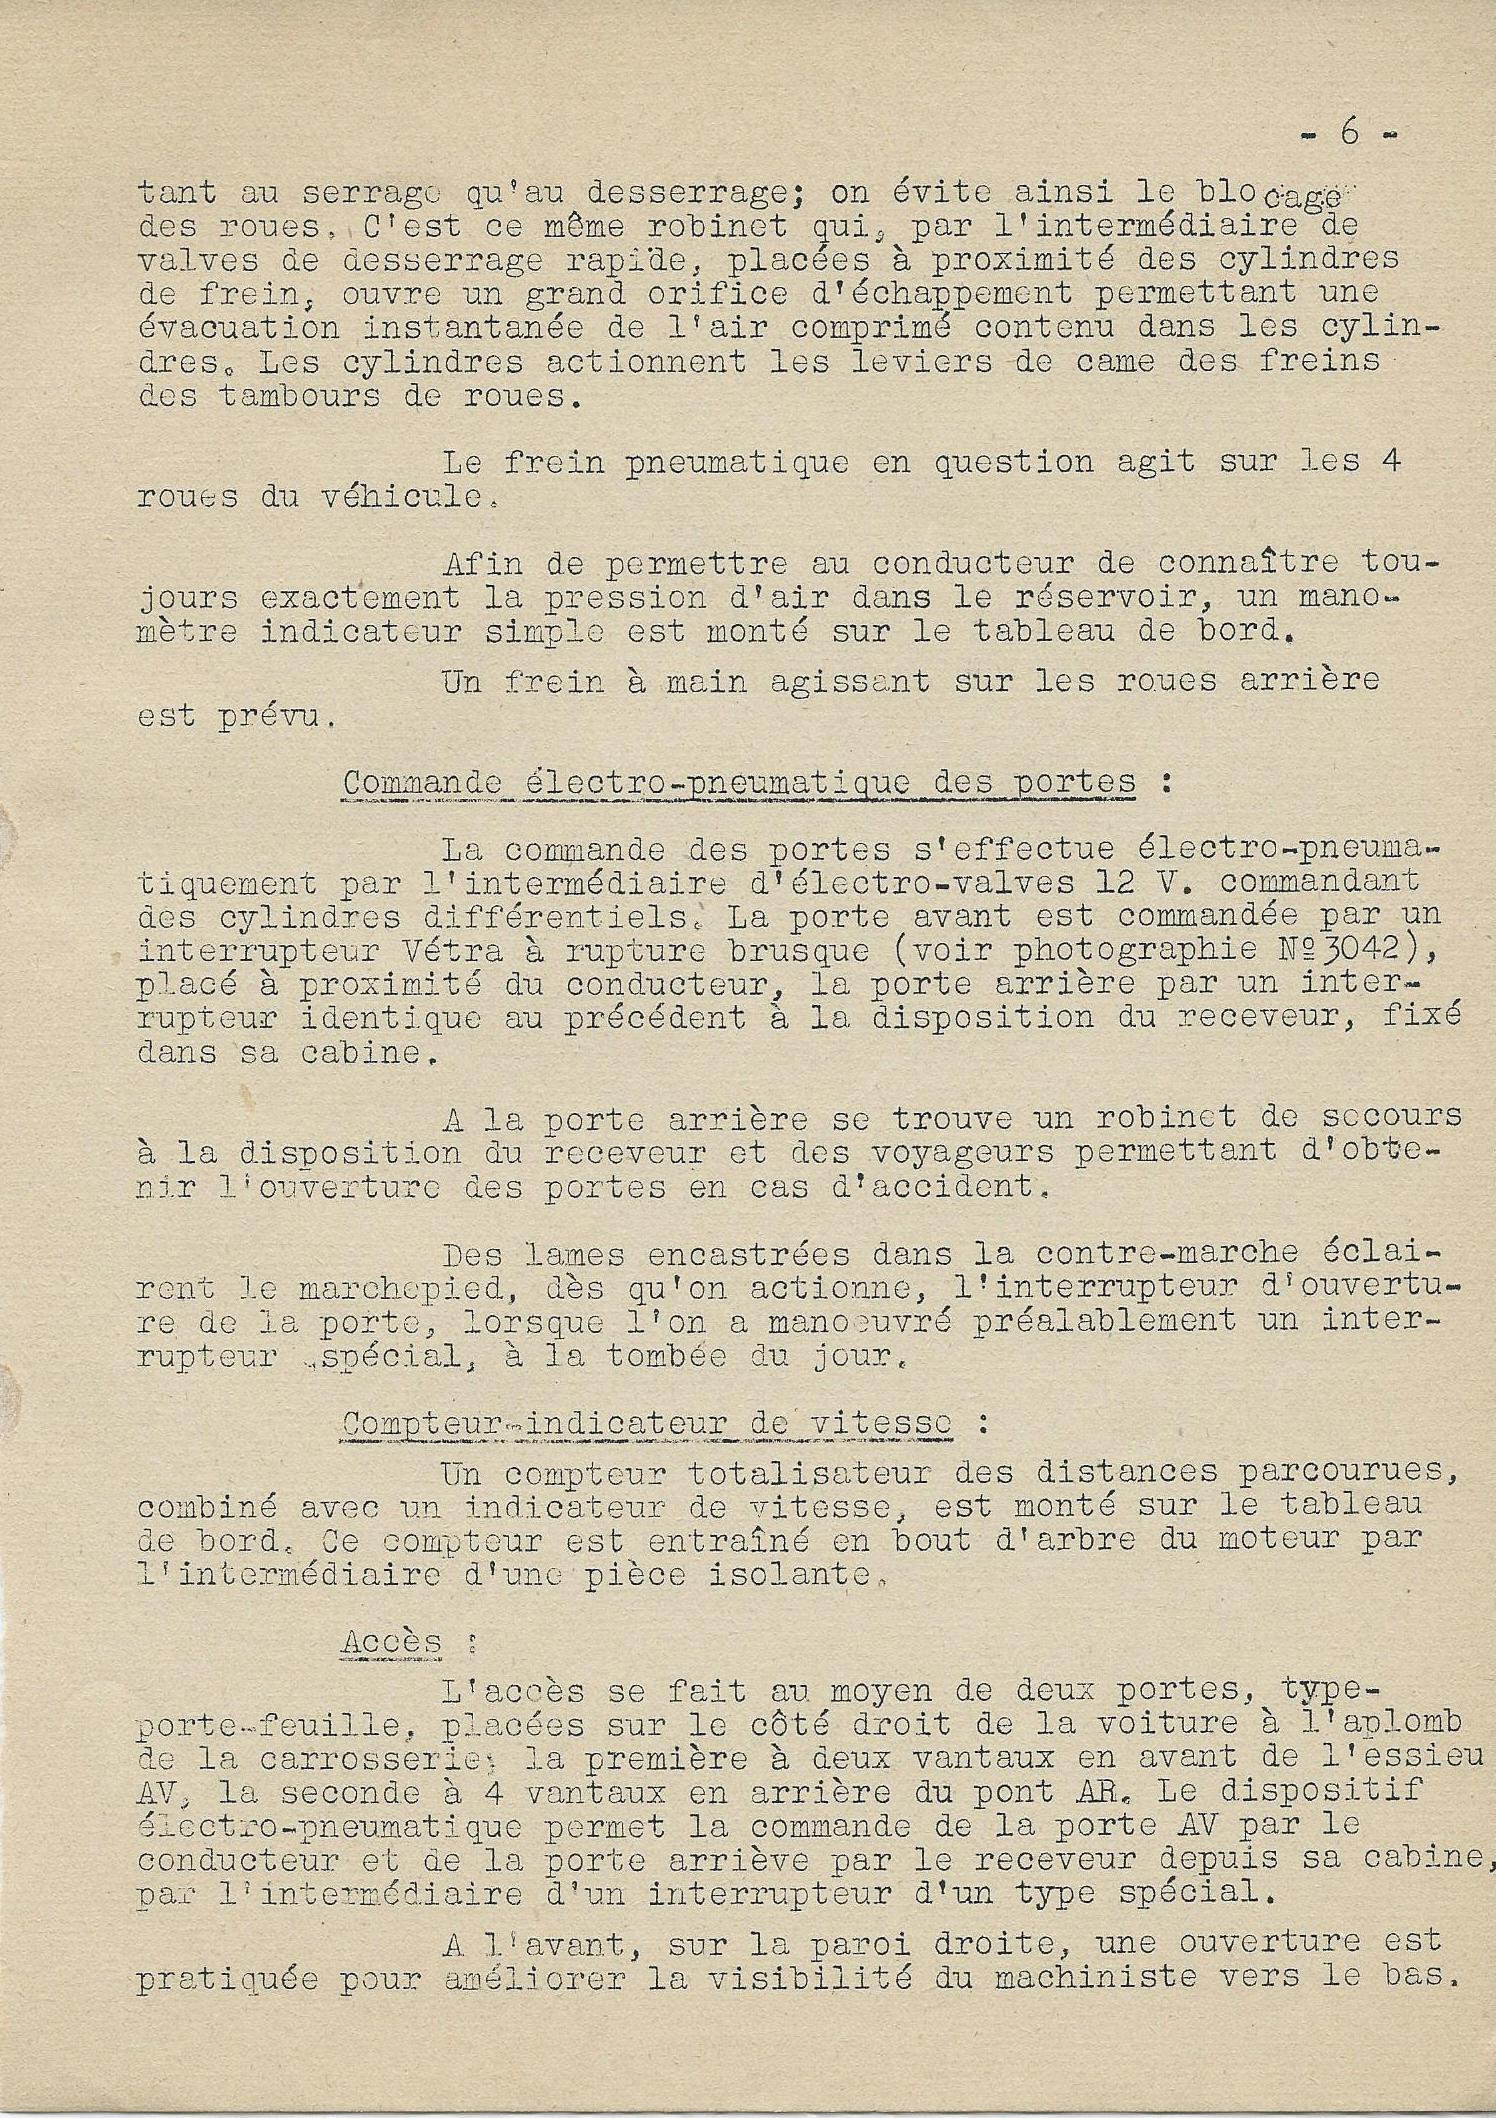 VRBh, série Aix-Marseille, str. 6